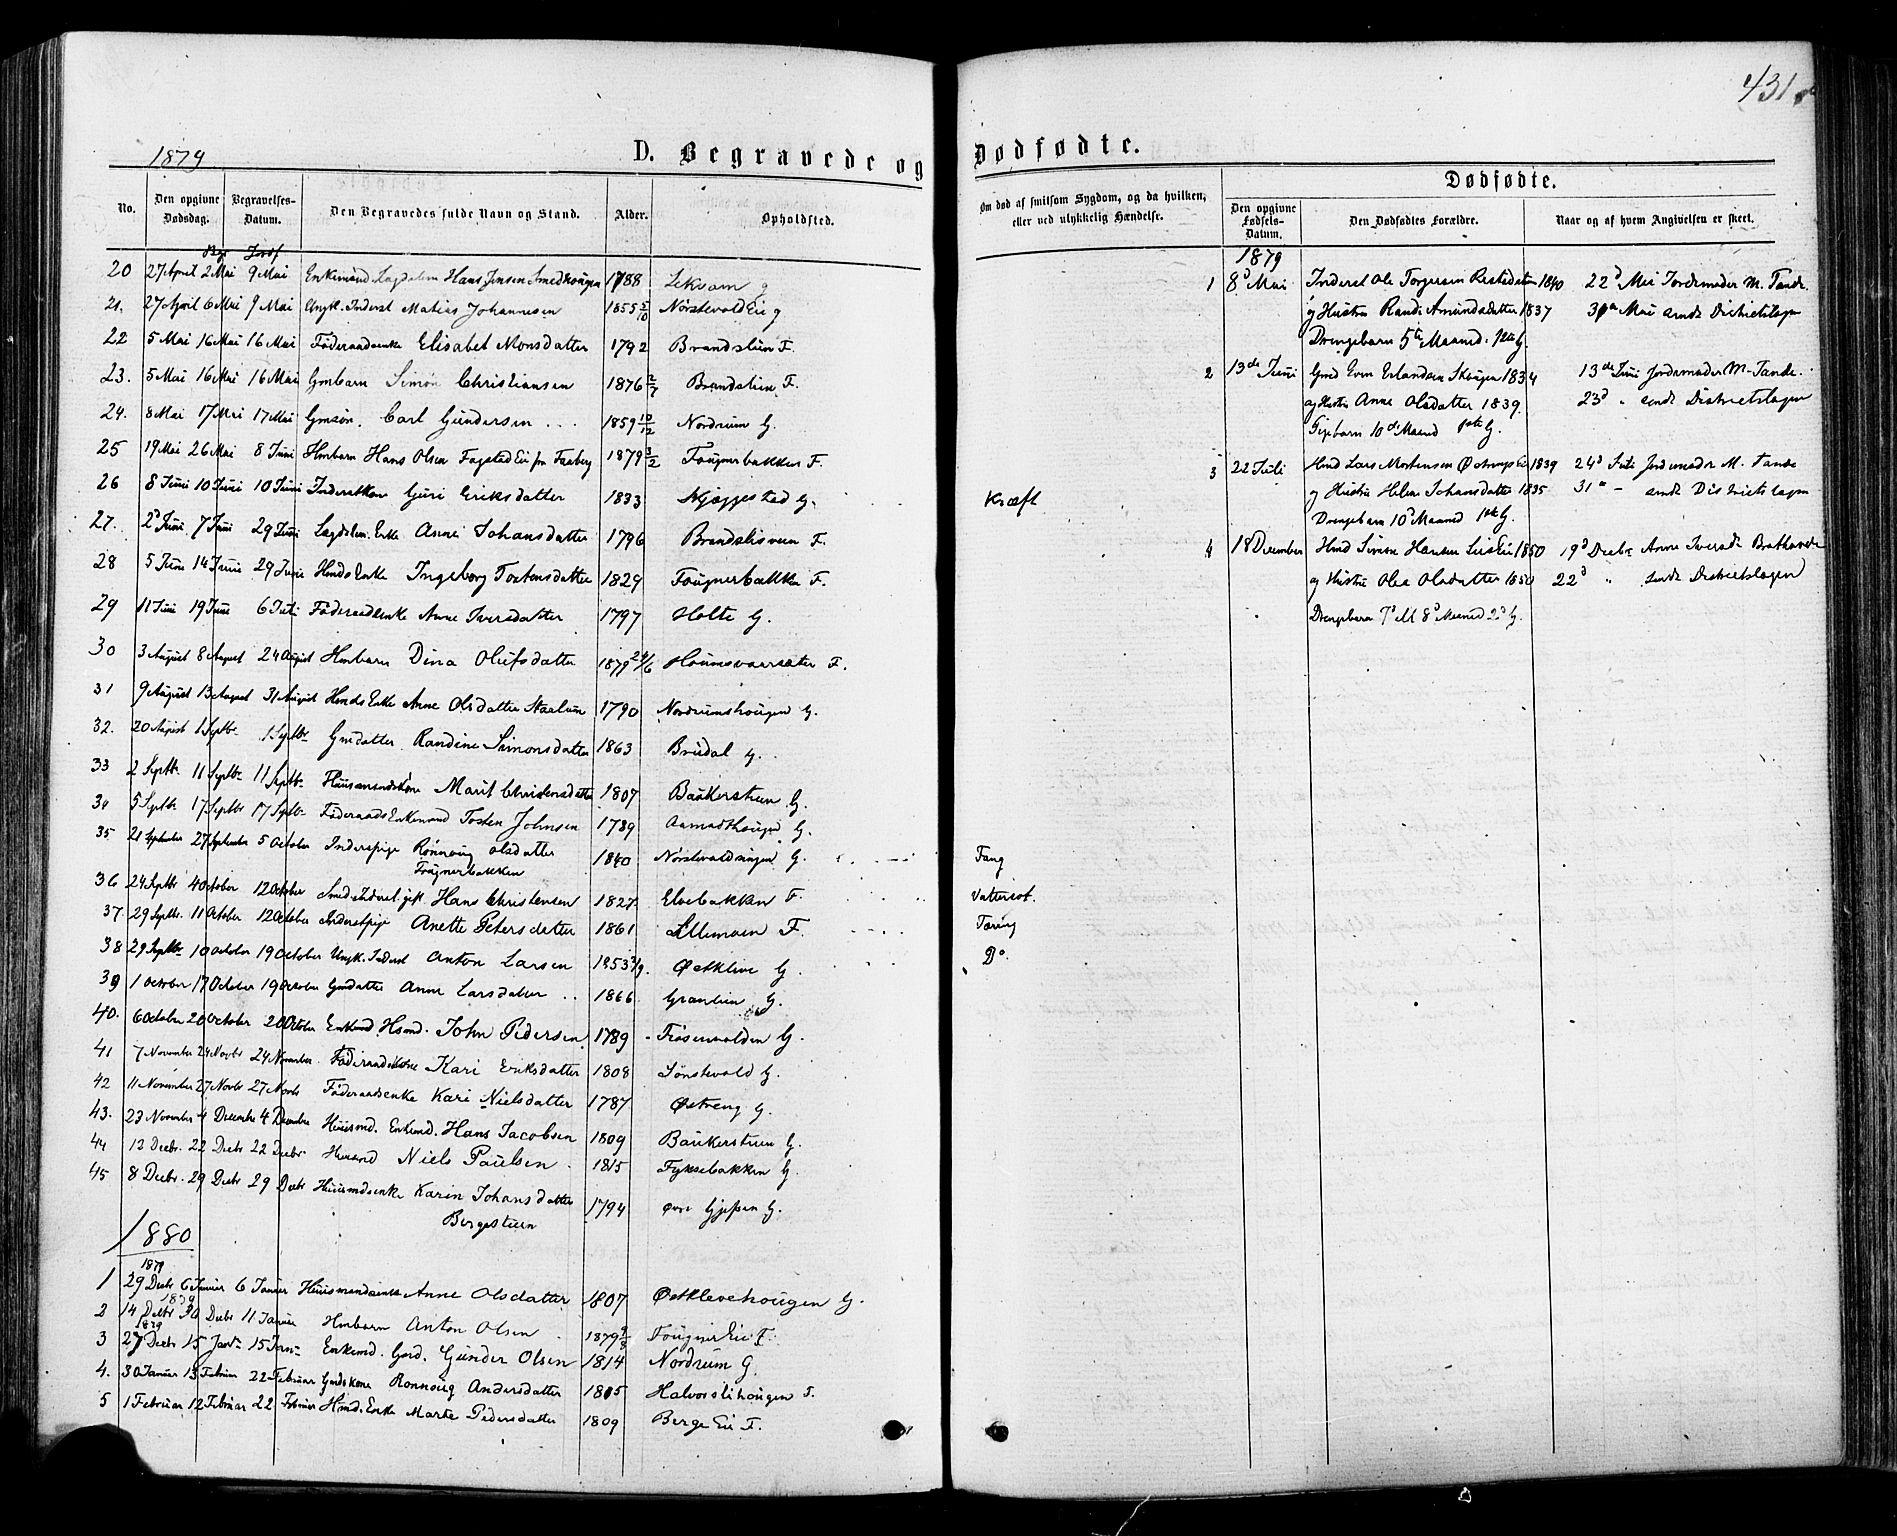 SAH, Østre Gausdal prestekontor, Ministerialbok nr. 1, 1874-1886, s. 431